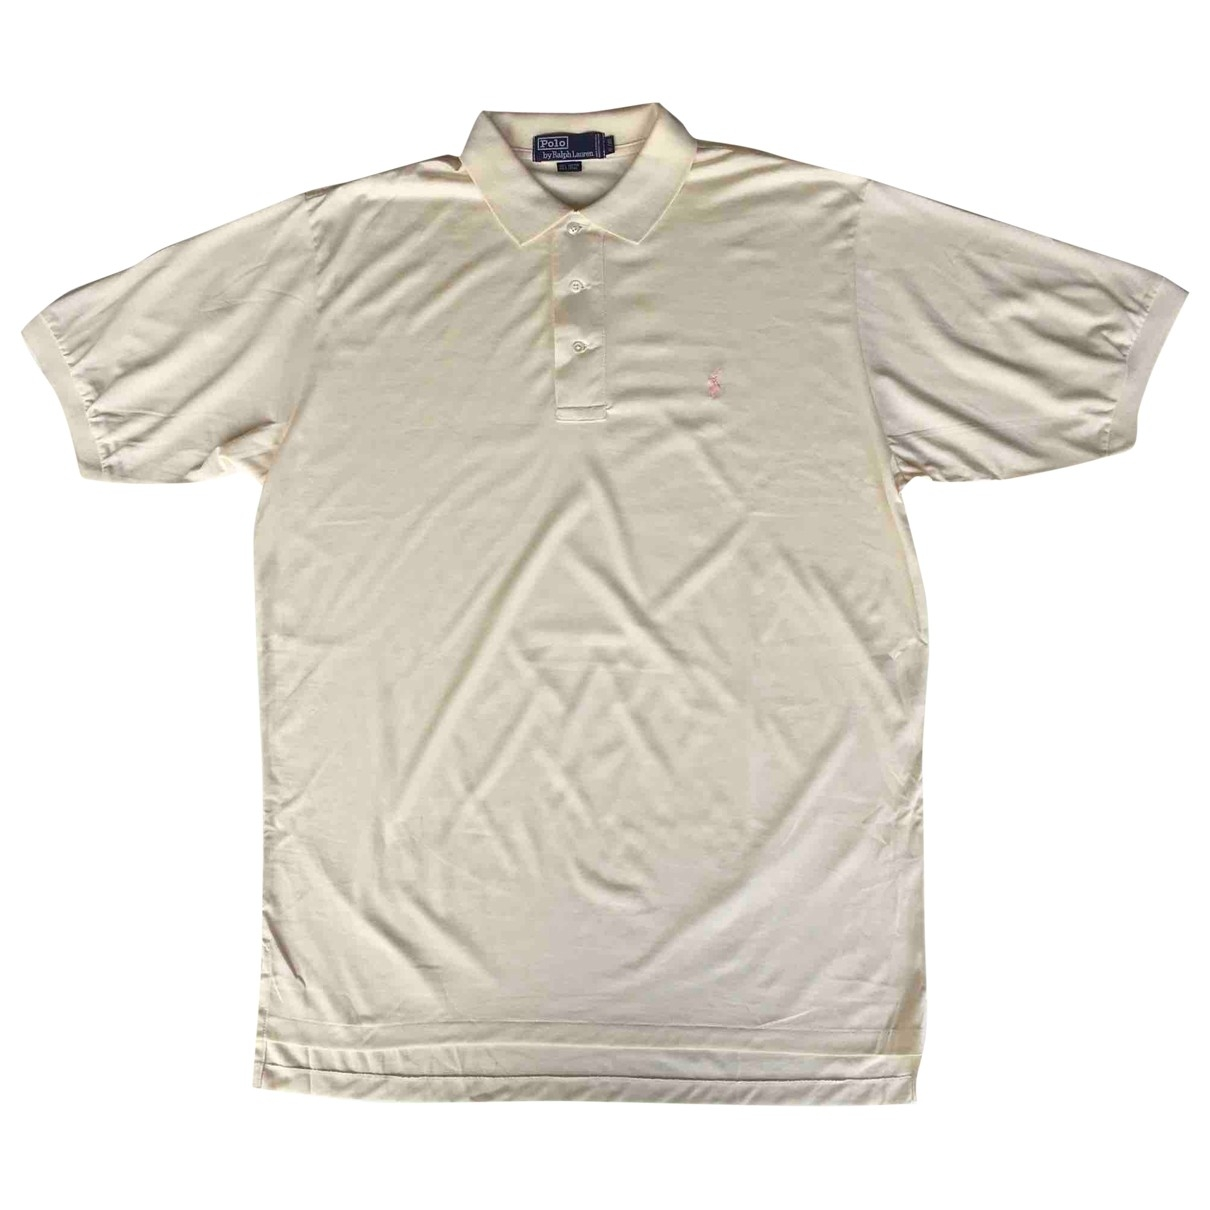 Polo Ralph Lauren Polo classique manches courtes Poloshirts in  Ecru Baumwolle